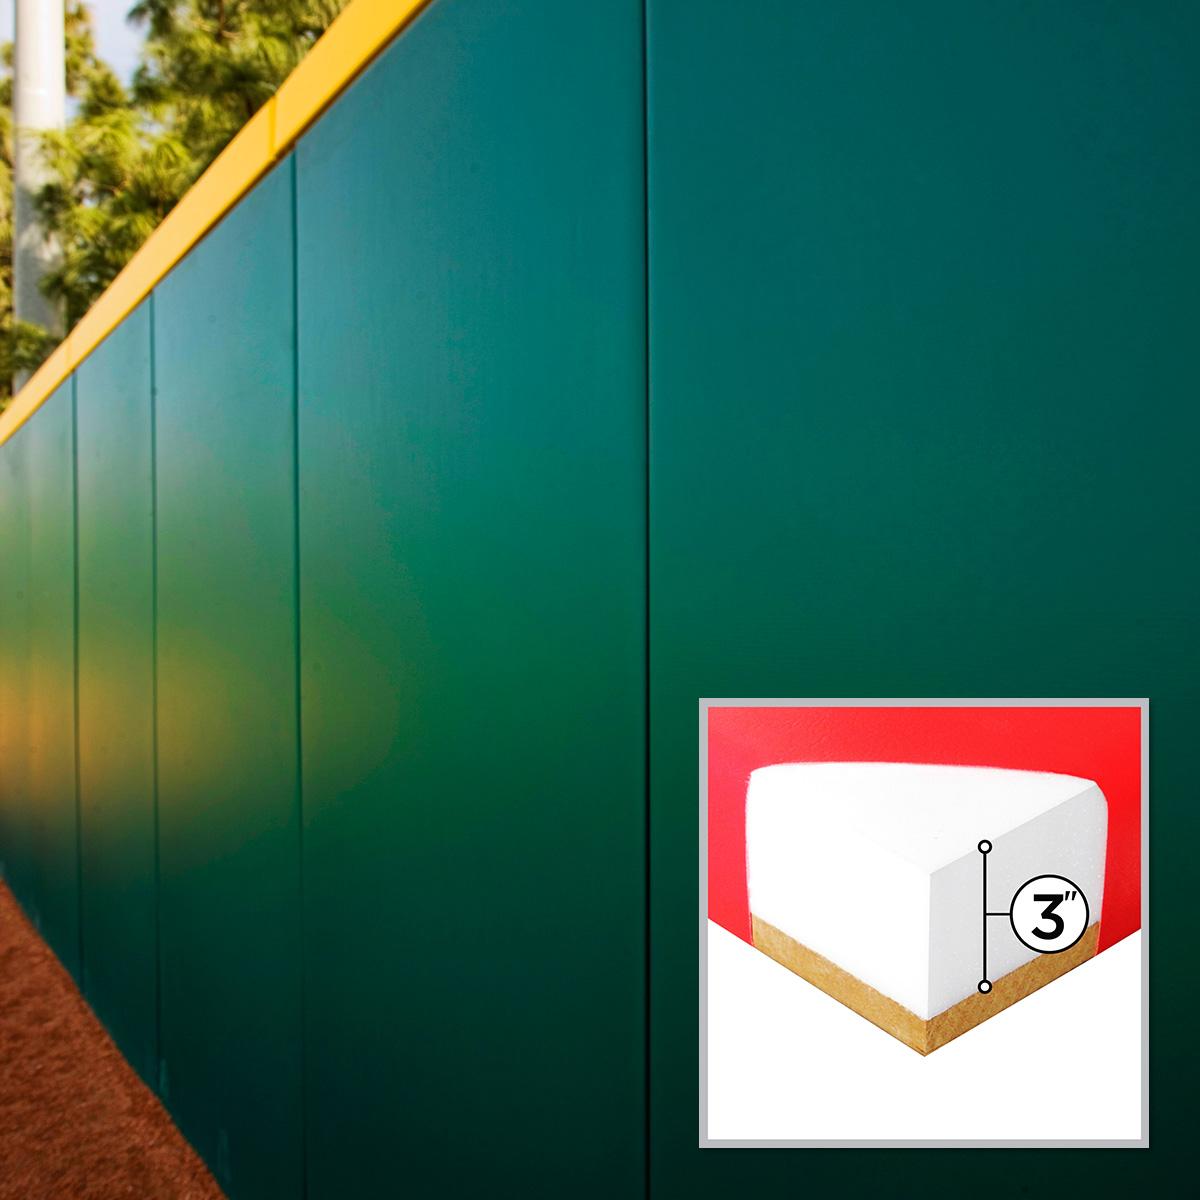 green and yellow stadium wall padding in rancho cucamonga california